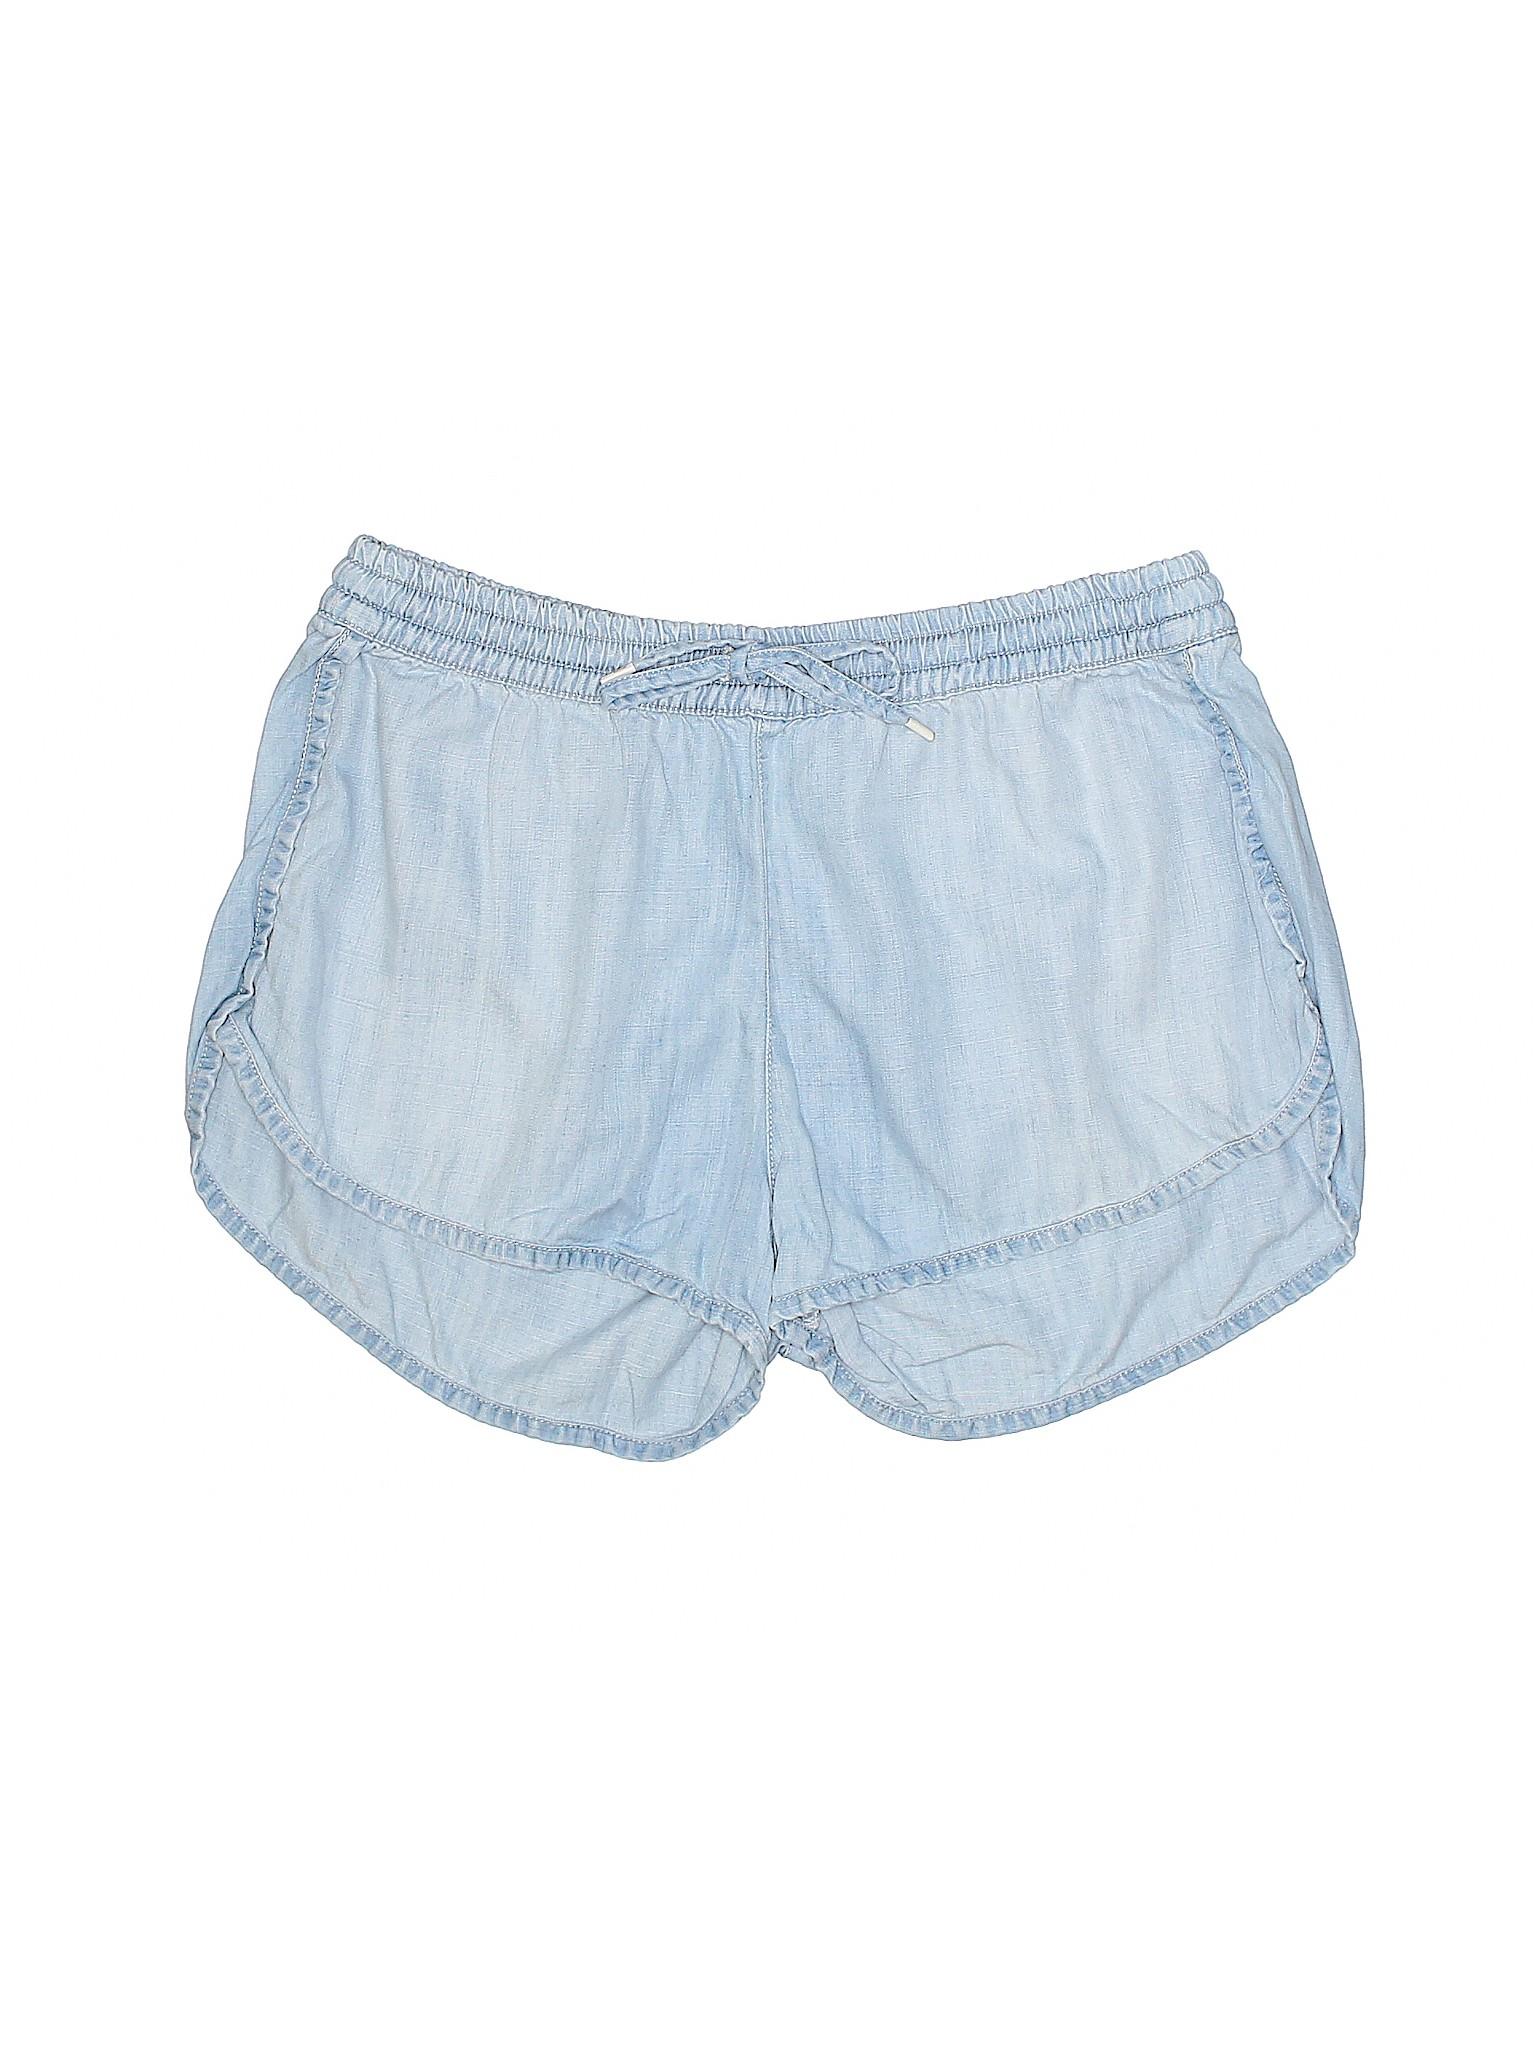 Shorts Leisure amp;m H Boutique Denim gqwUOP